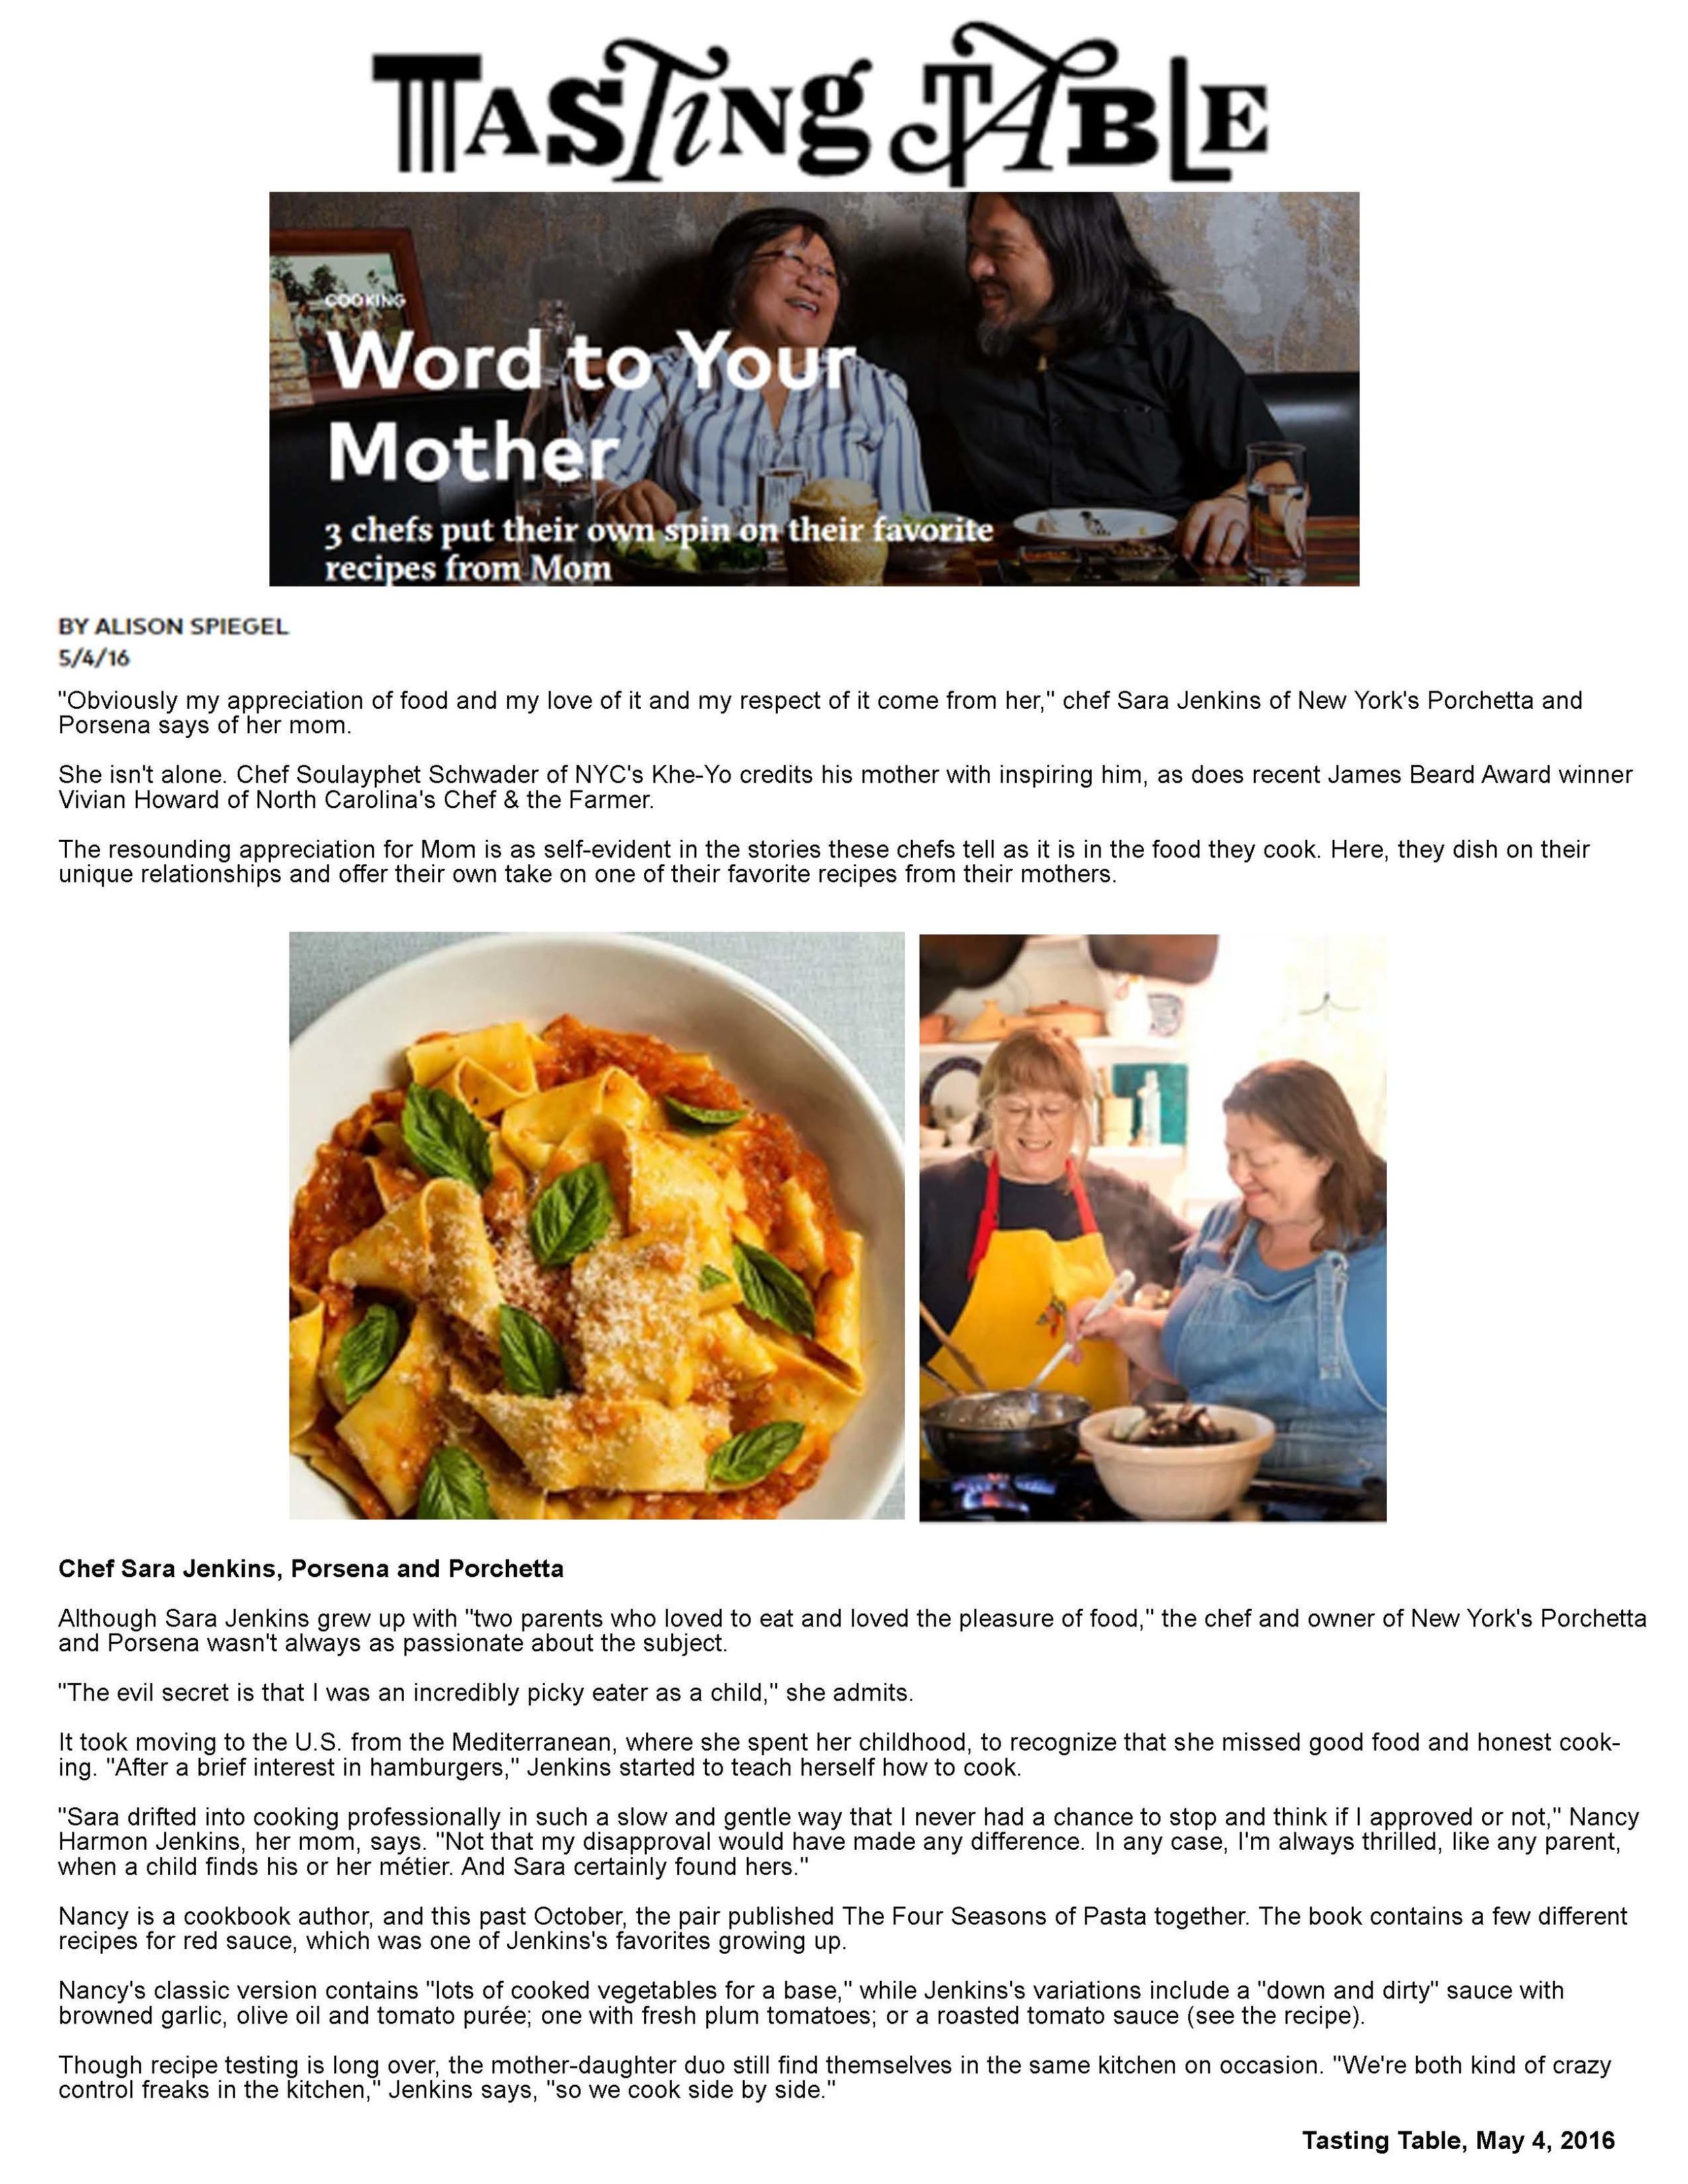 WEBSITE_Tasting Table_Four Seasons of Pasta_05.04.jpg